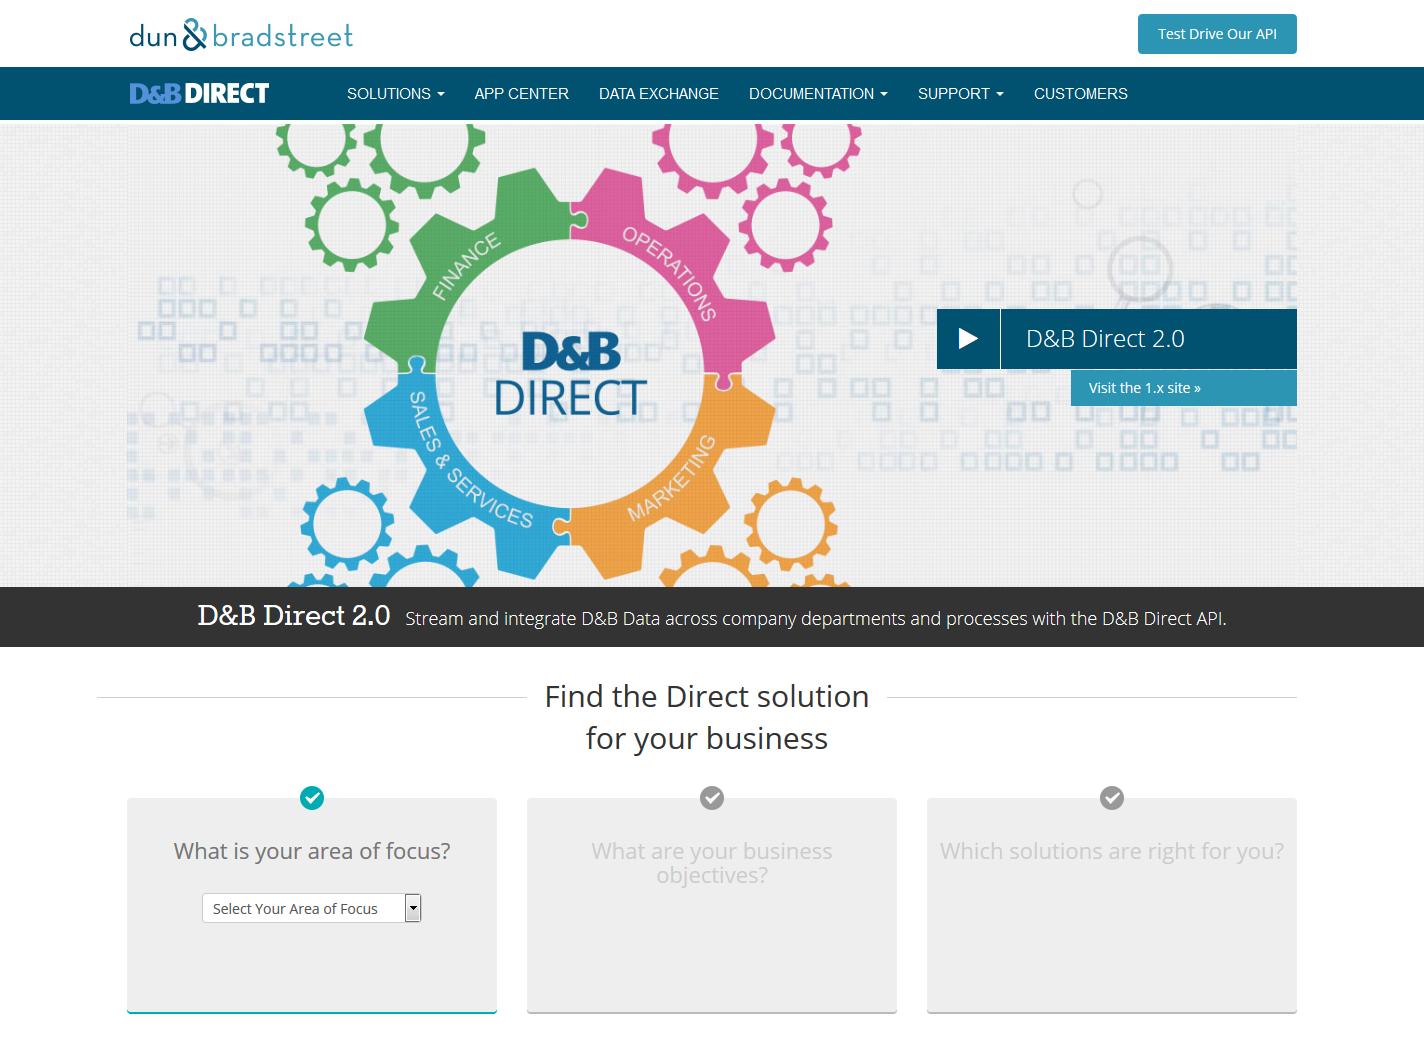 Developer portal - Dun & Bradstreet